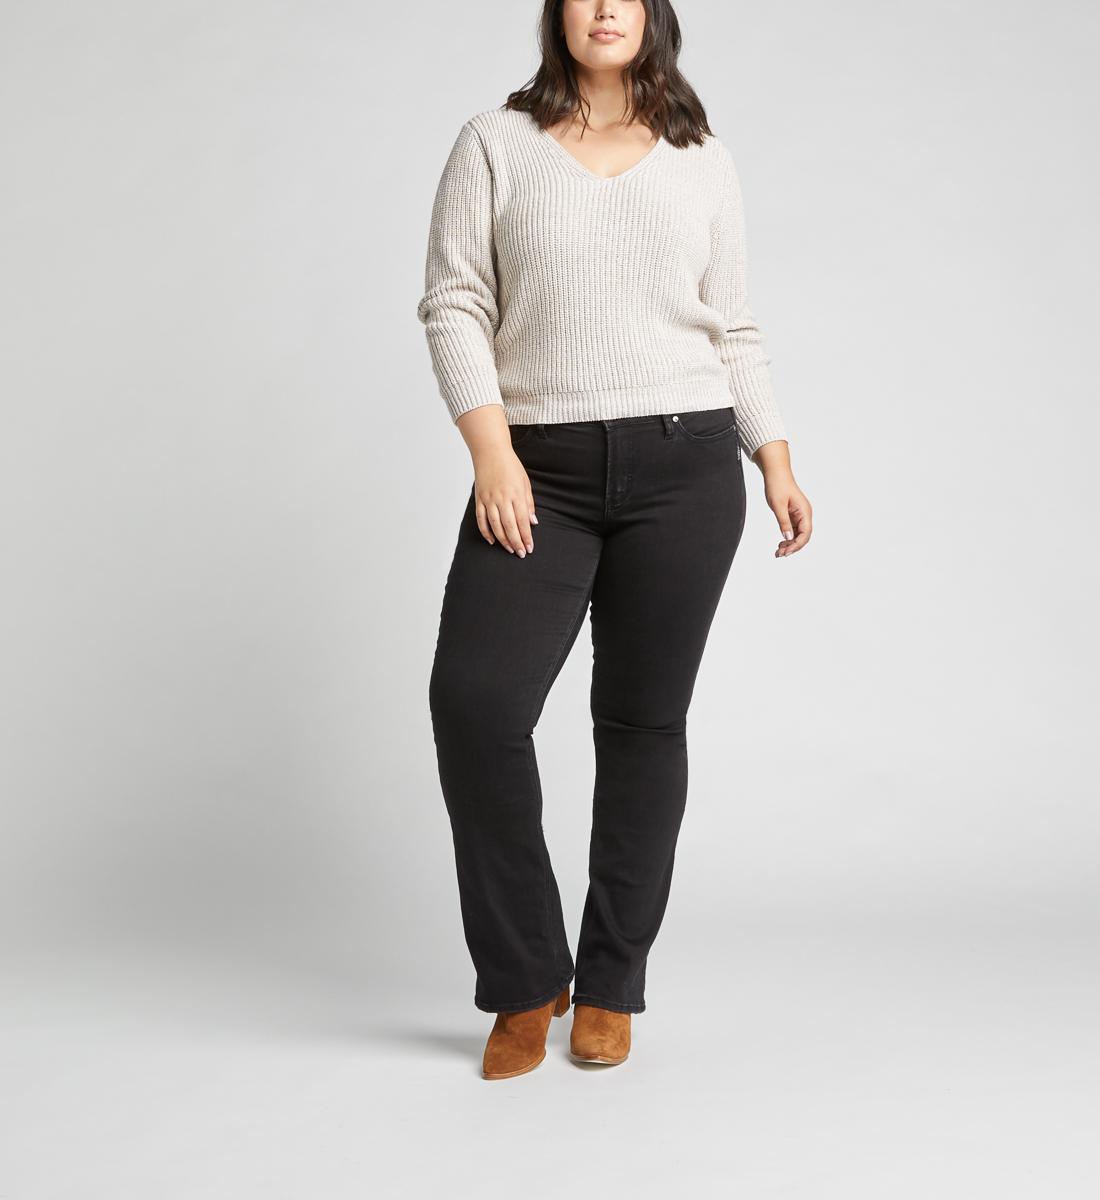 Silver Jeans Suki Mid Rise Slim Bootcut Jeans Plus Size